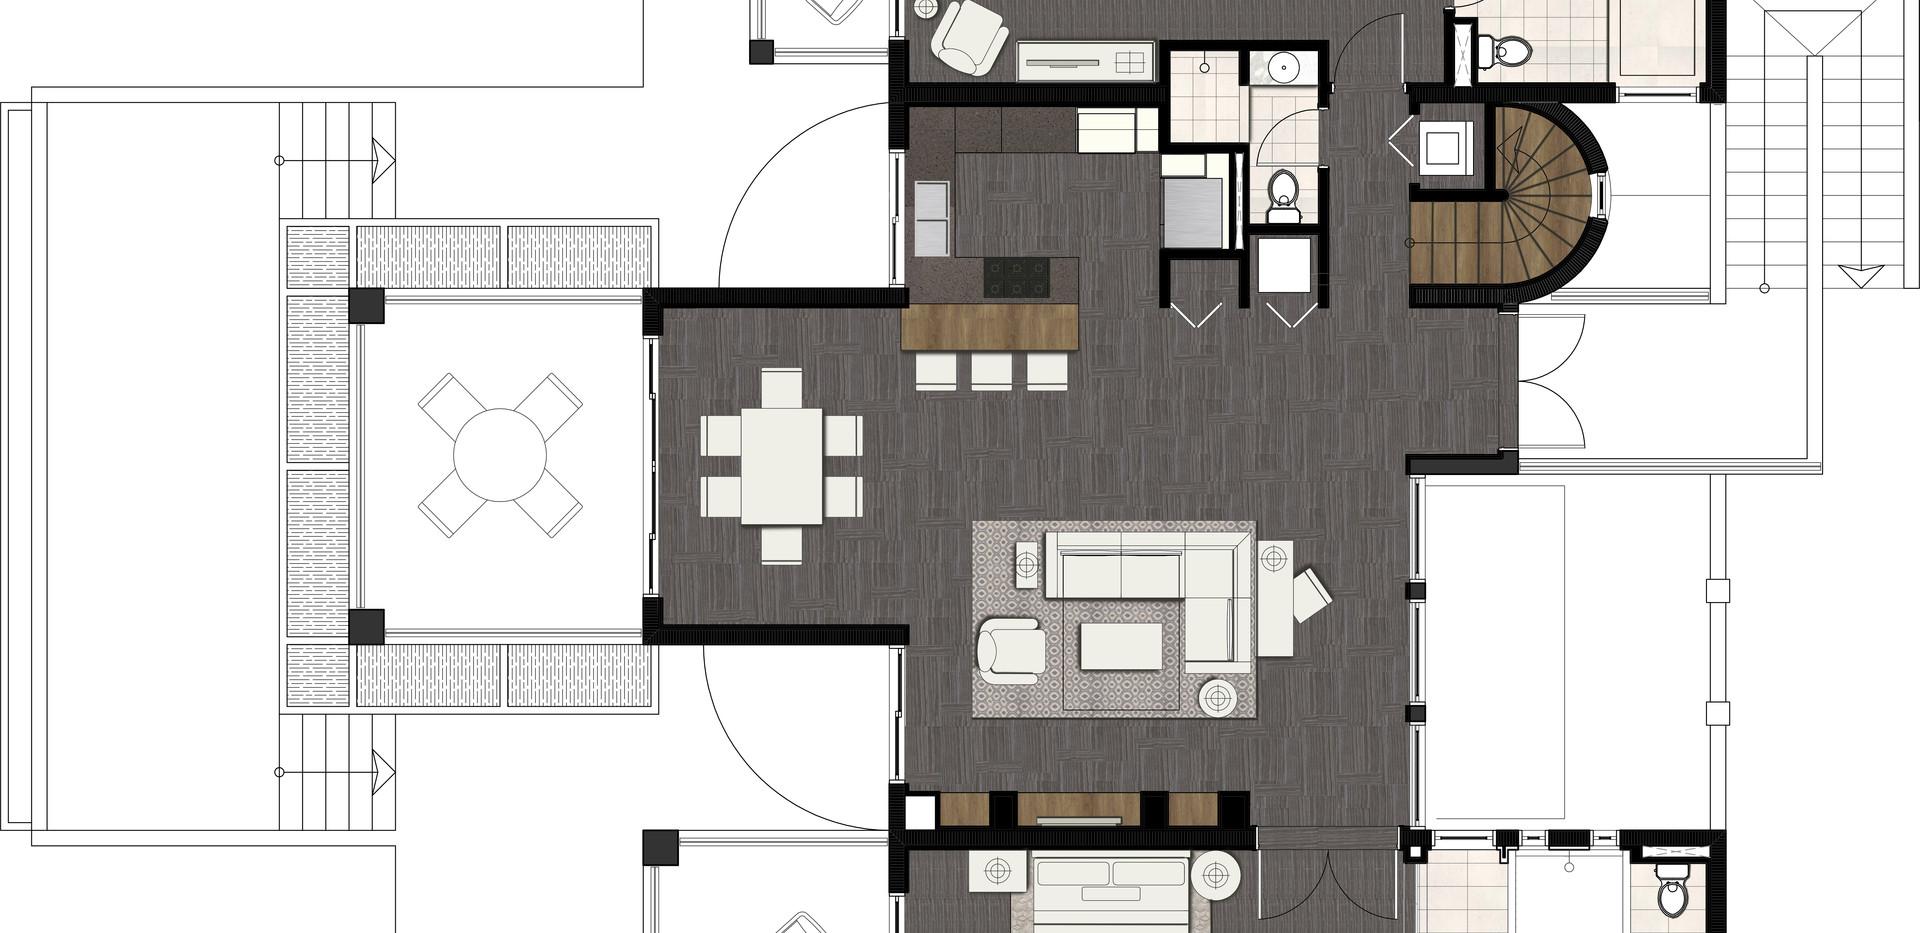 New Villas Two Bedroom Plan